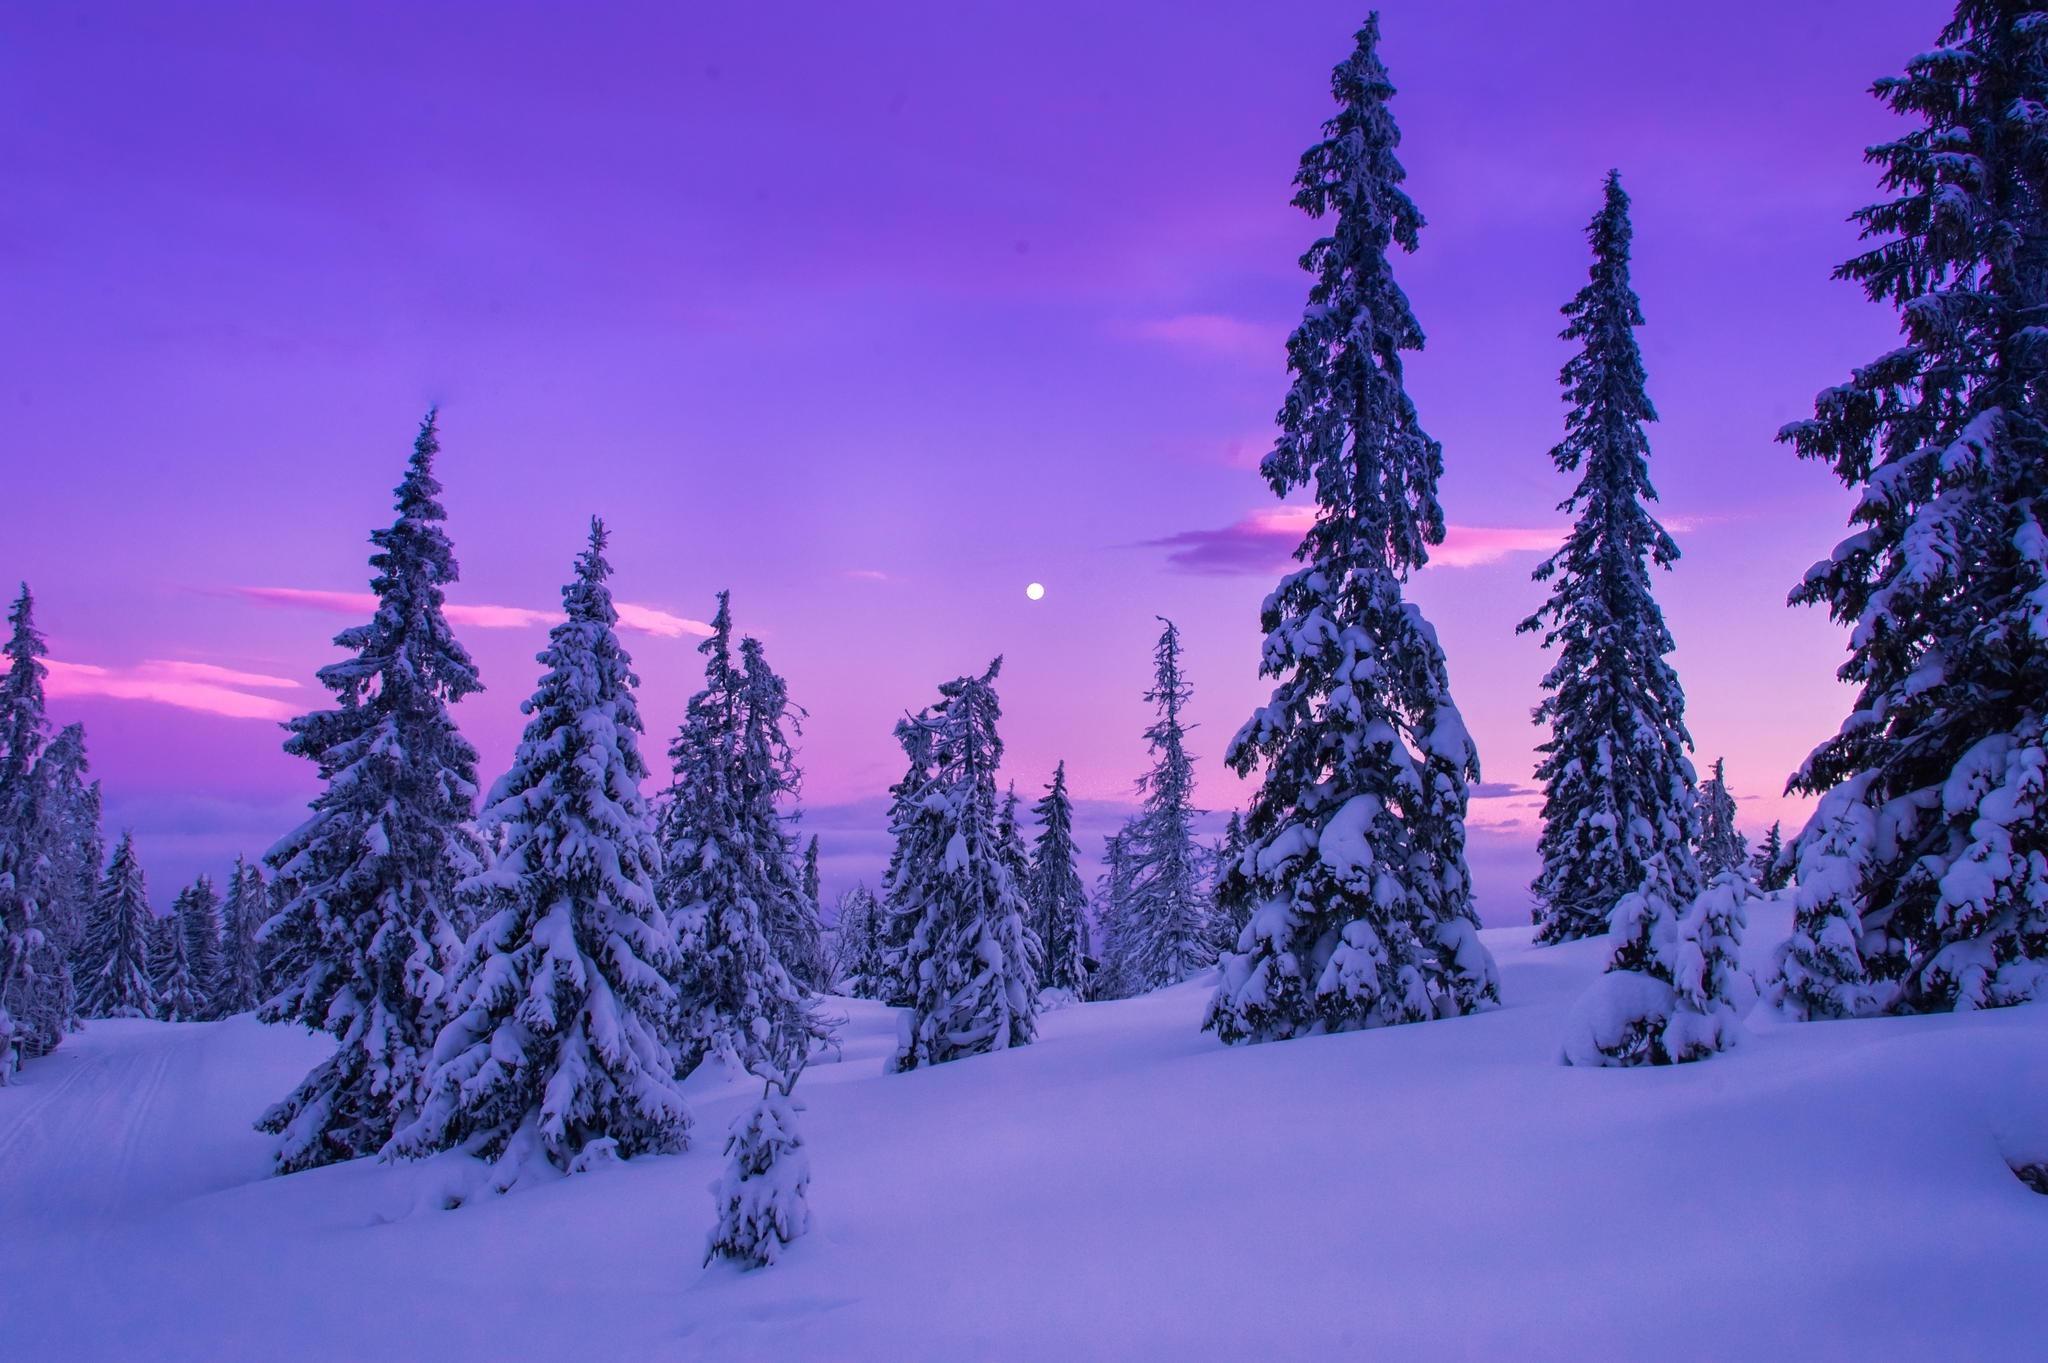 Wallpaper landscape forest nature snow winter - Wallpaper hd nature winter ...